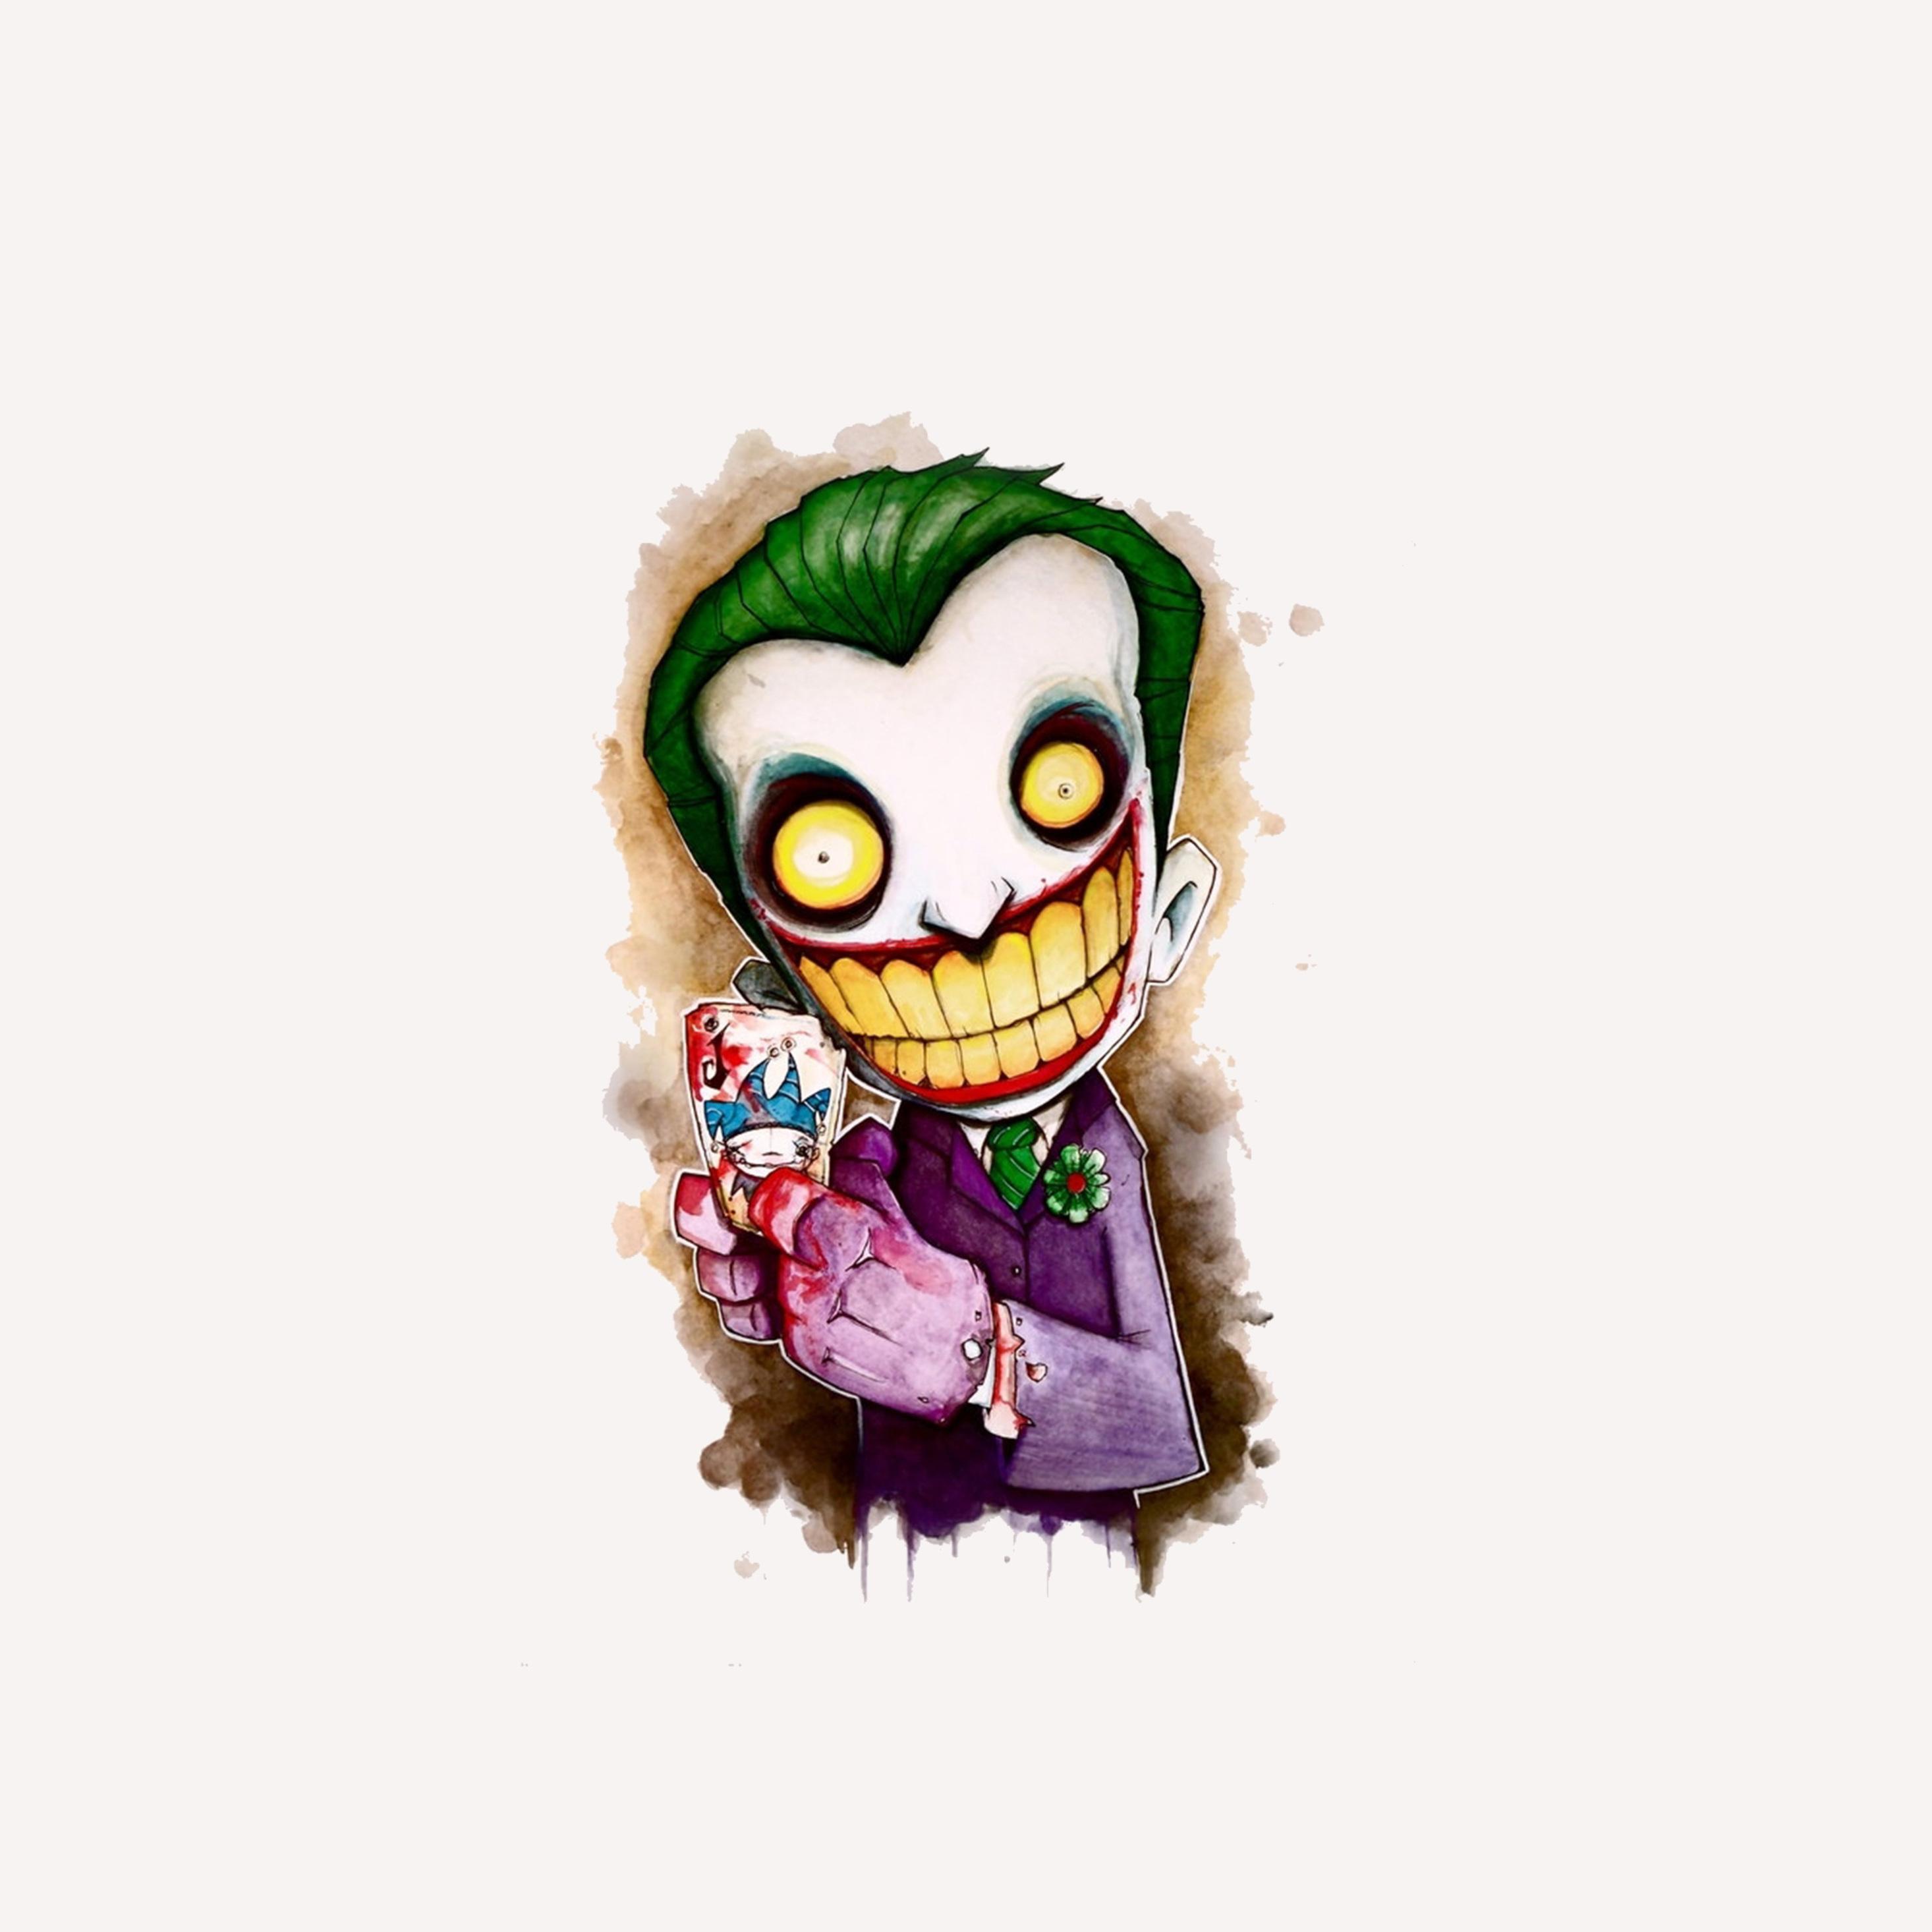 Cartoon Joker Wallpaper Hd – Jerusalem House